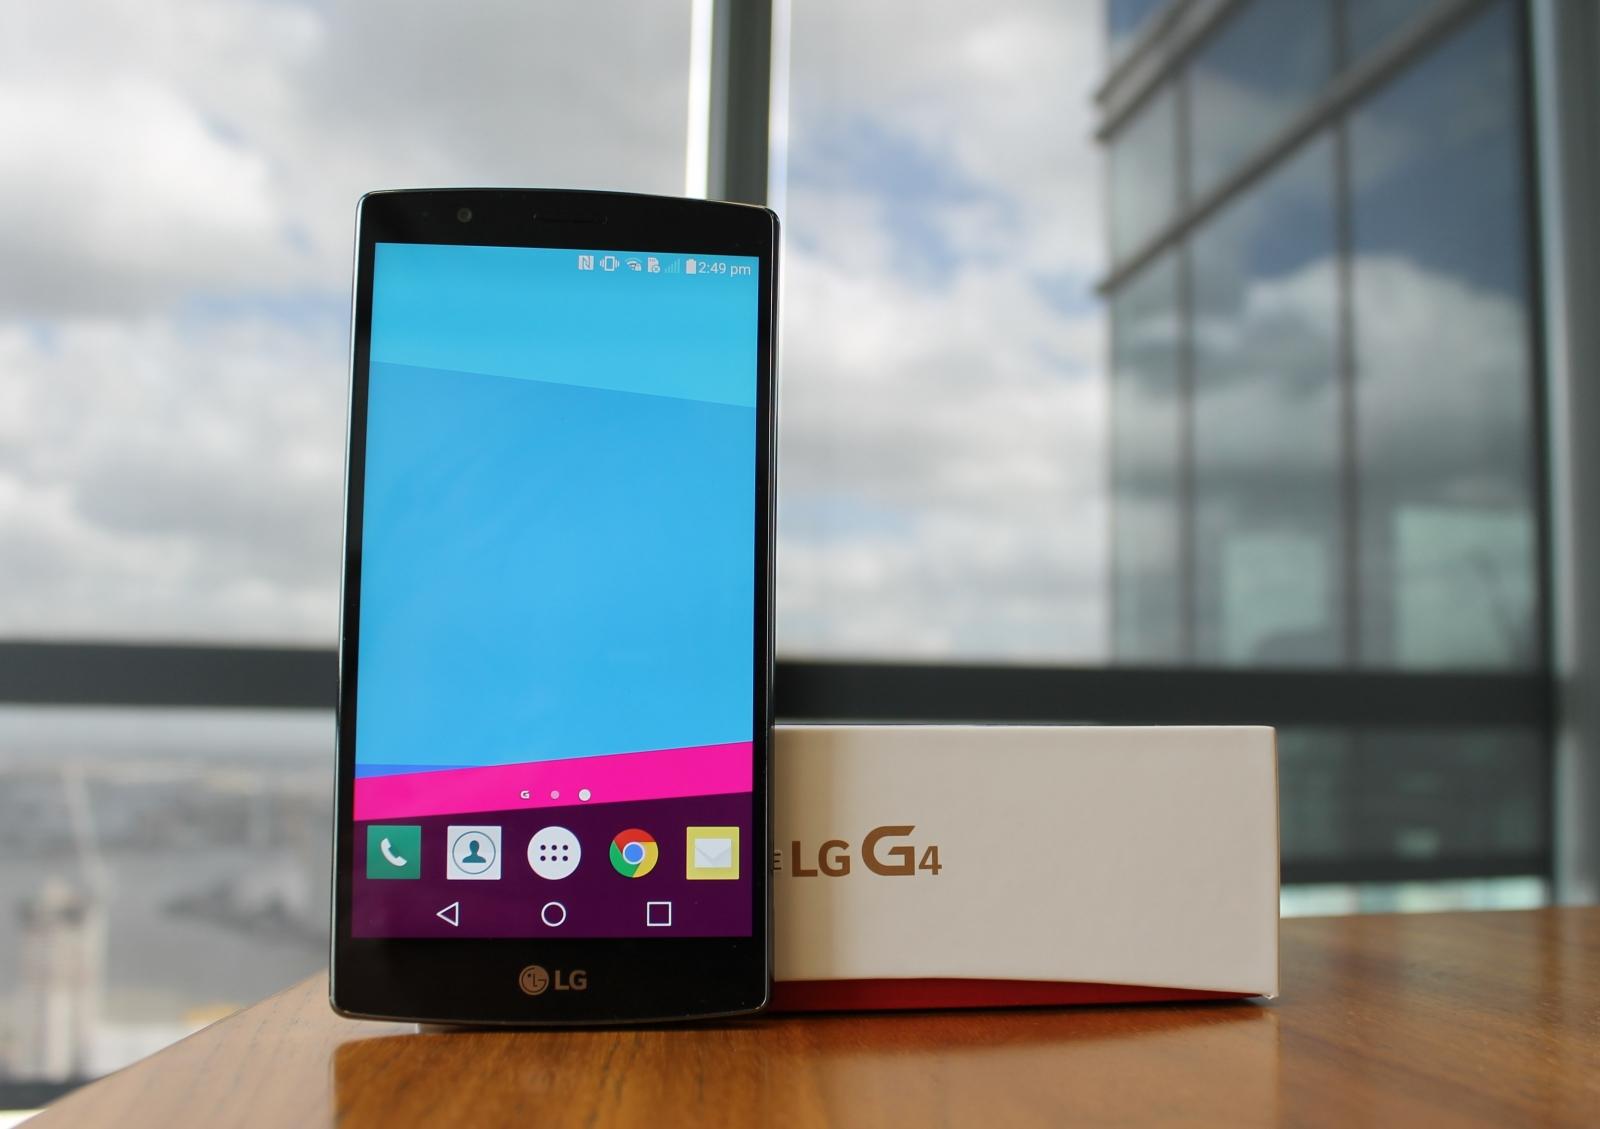 Best UK smartphone deals LG G4